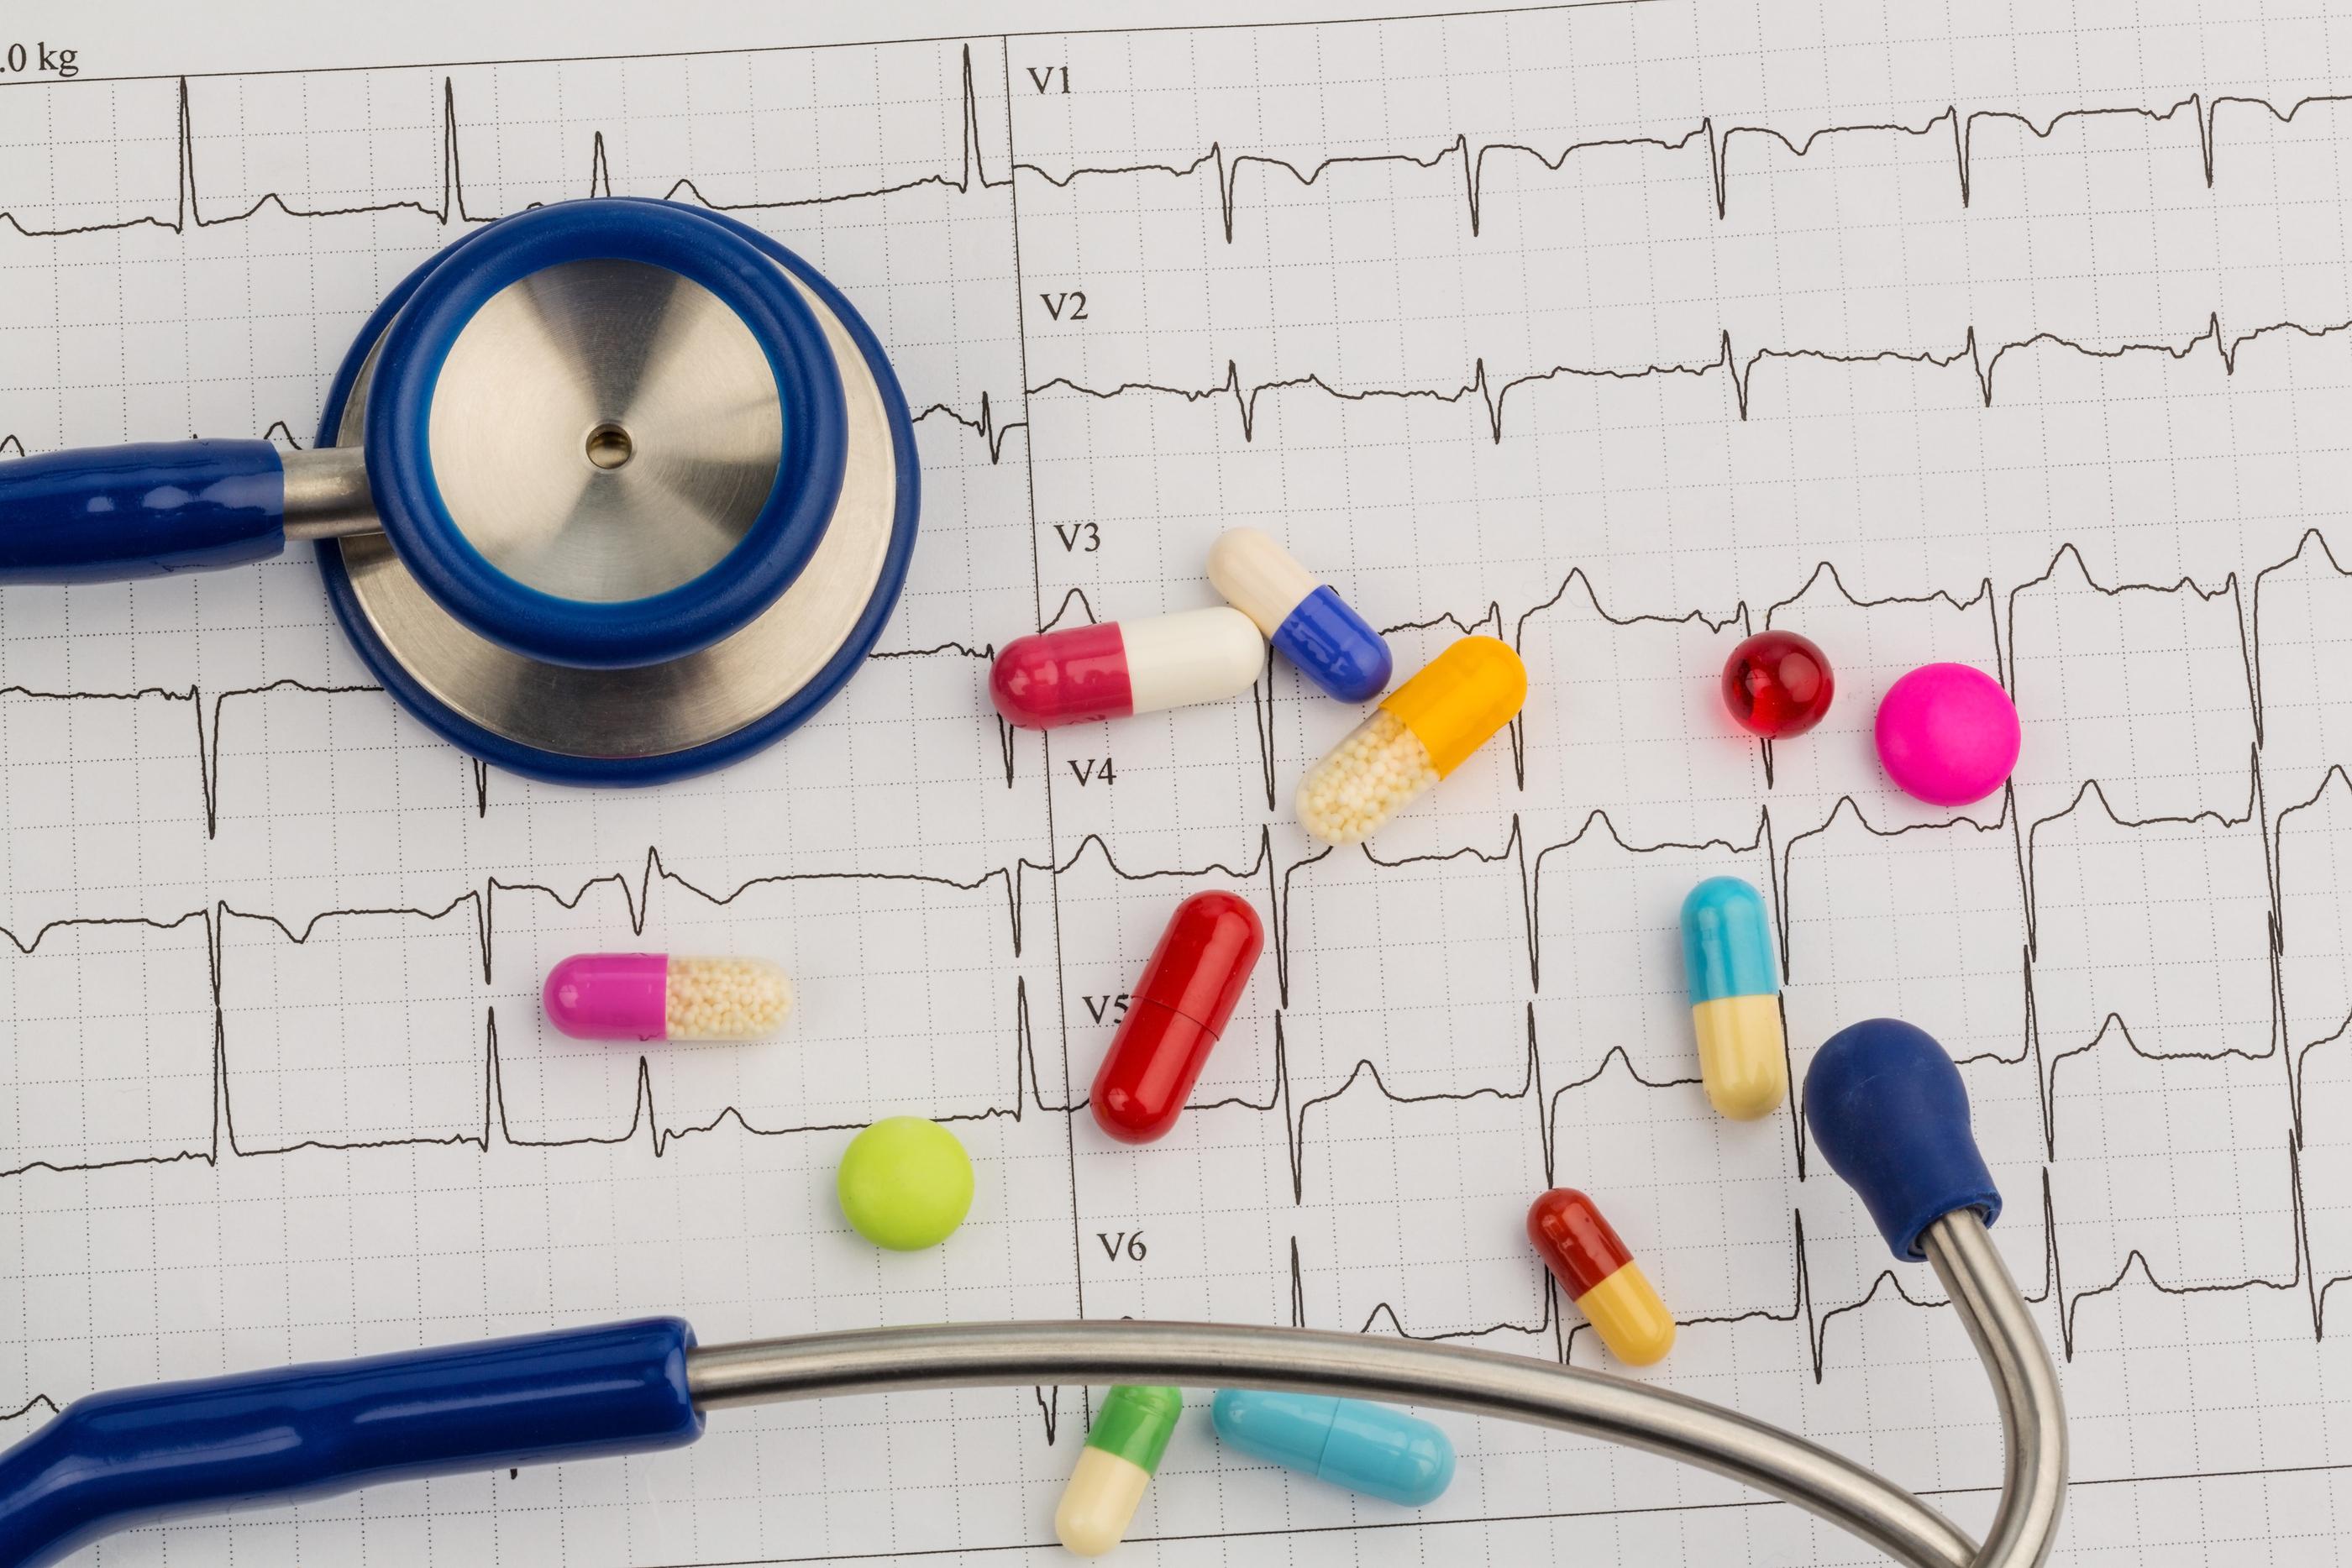 ECG & Pharmacology Courses